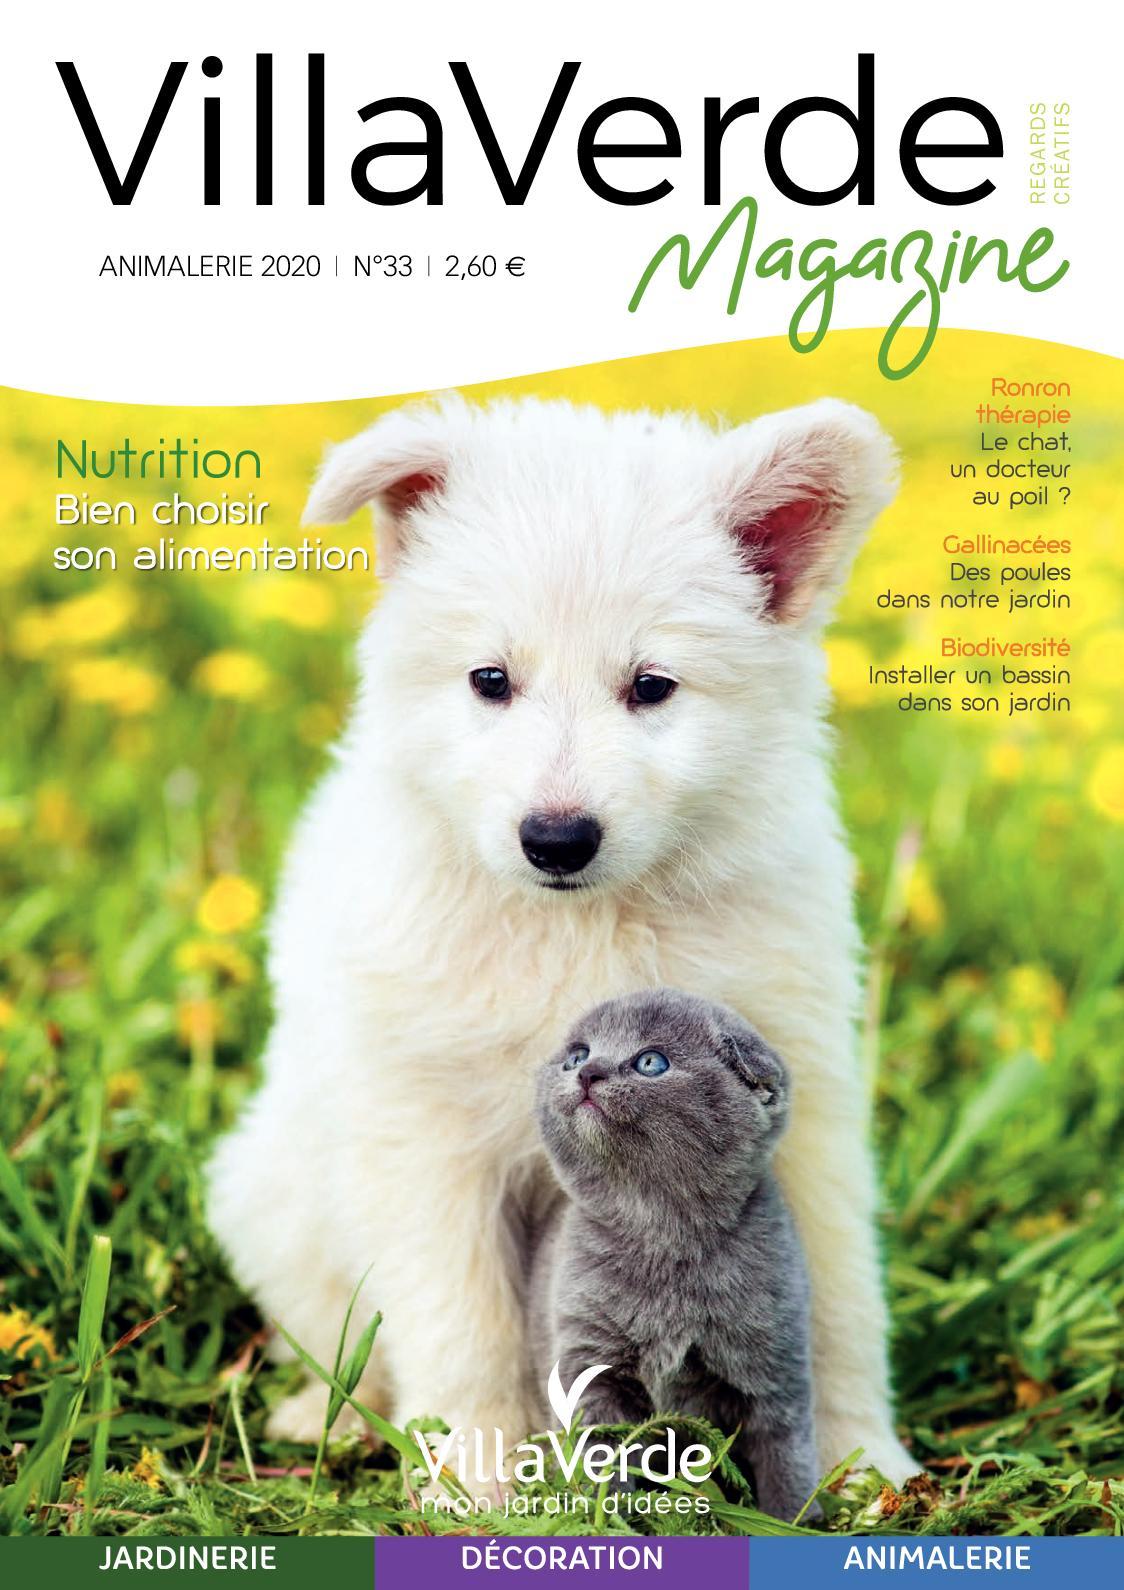 magazine villaverde animalerie 2020